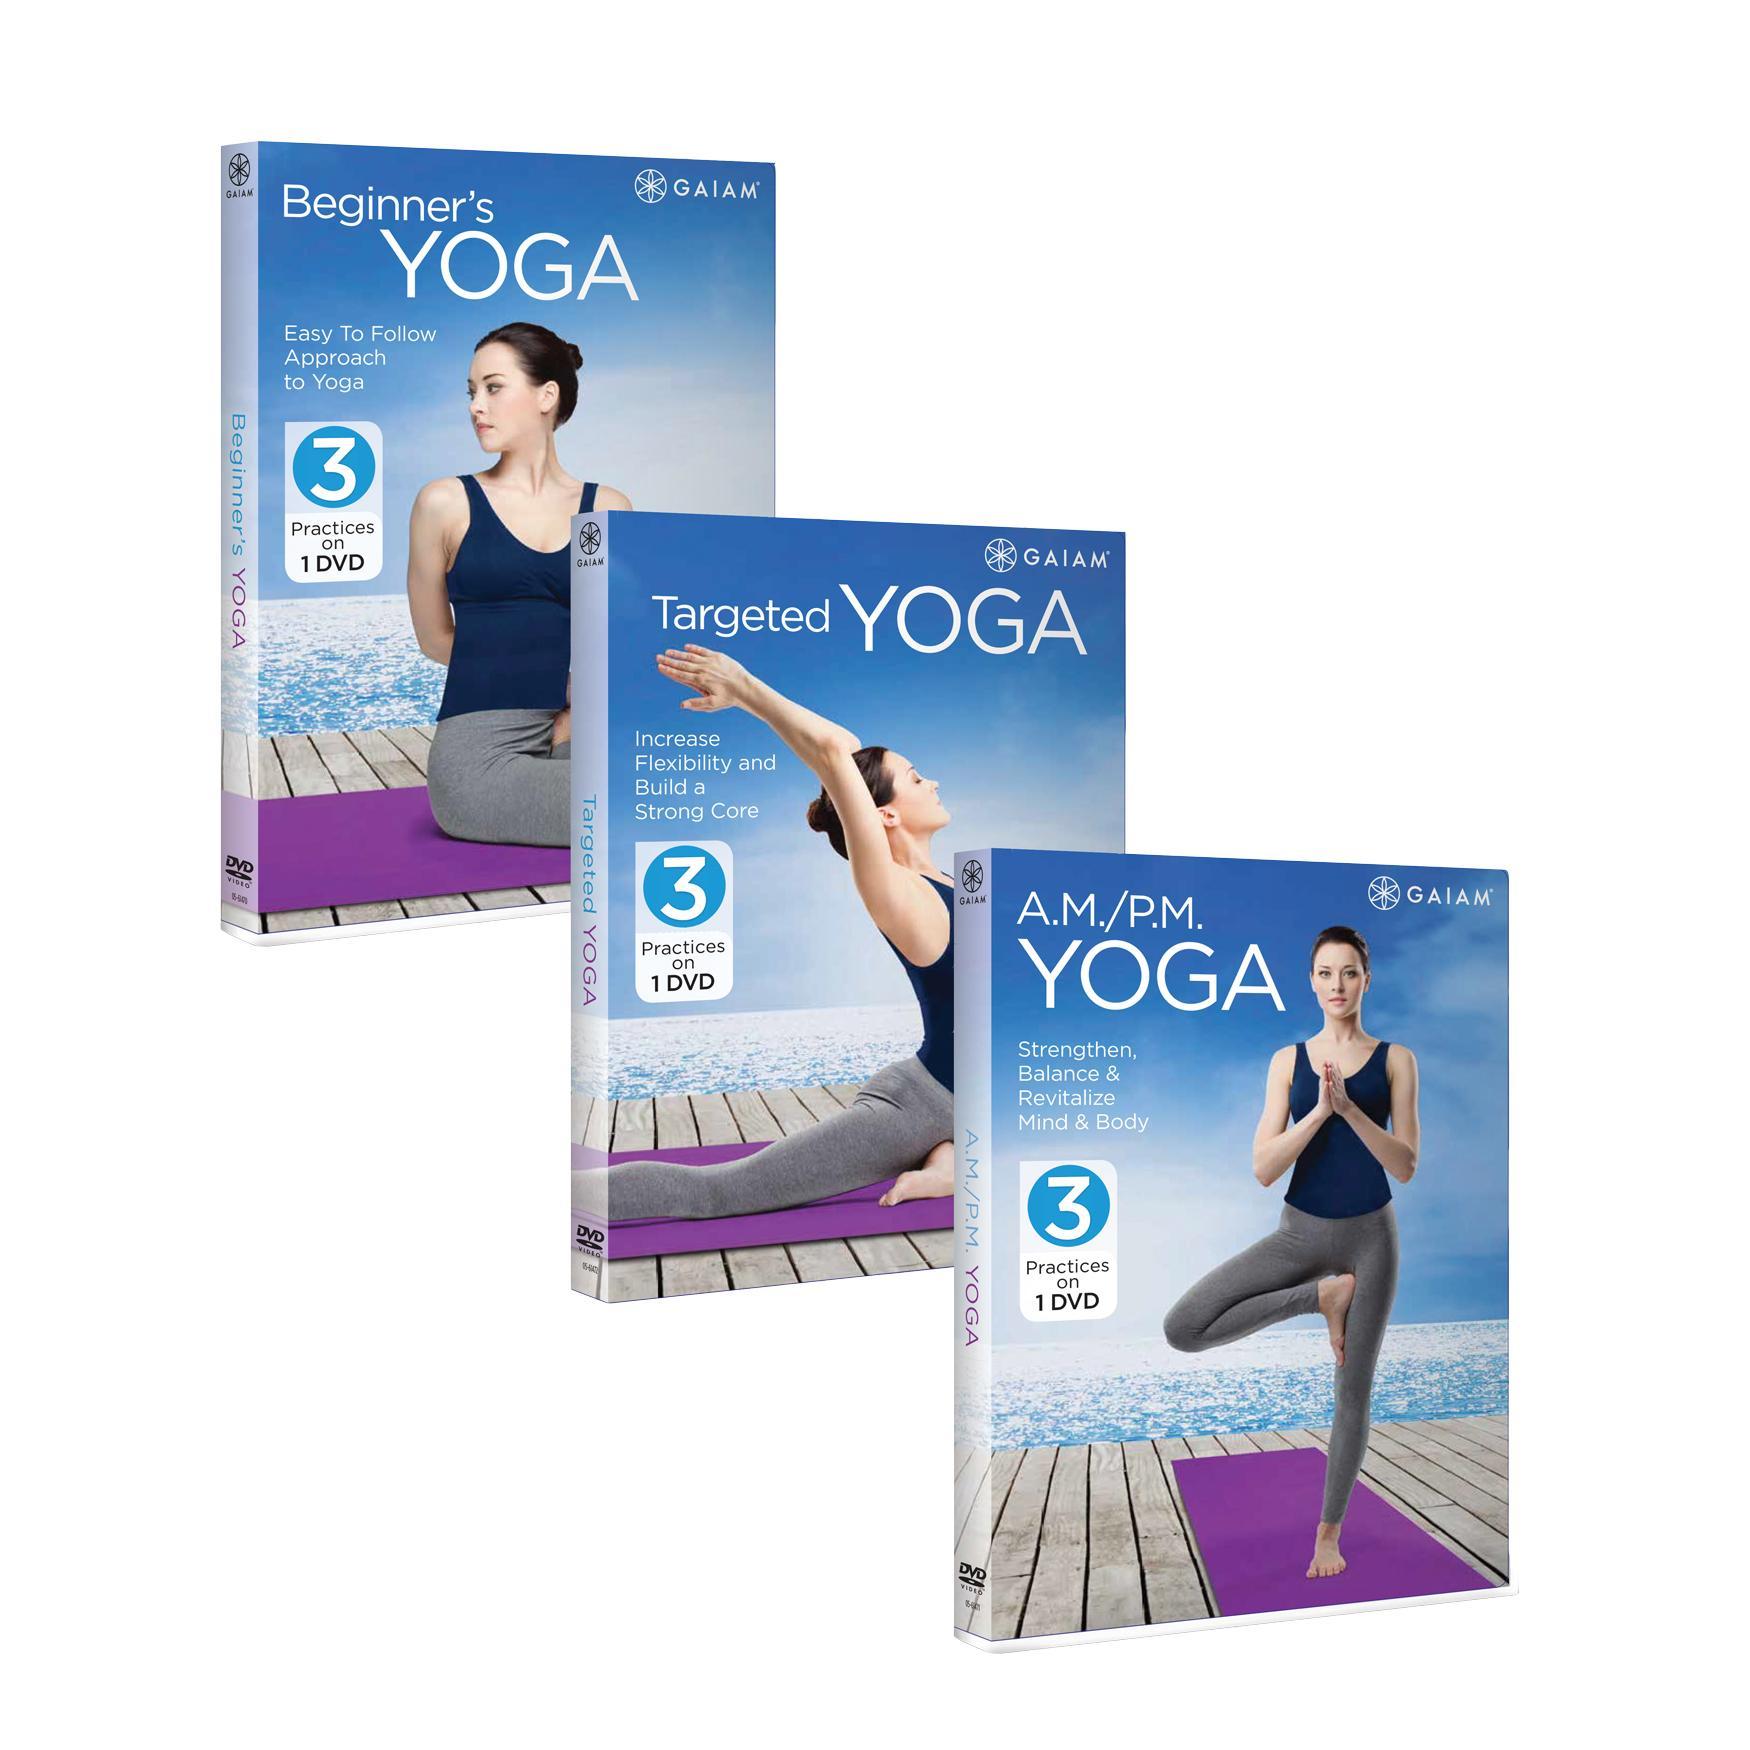 Amazon.com : Gaiam Yoga Beginner's DVD Kit : Sports & Outdoors